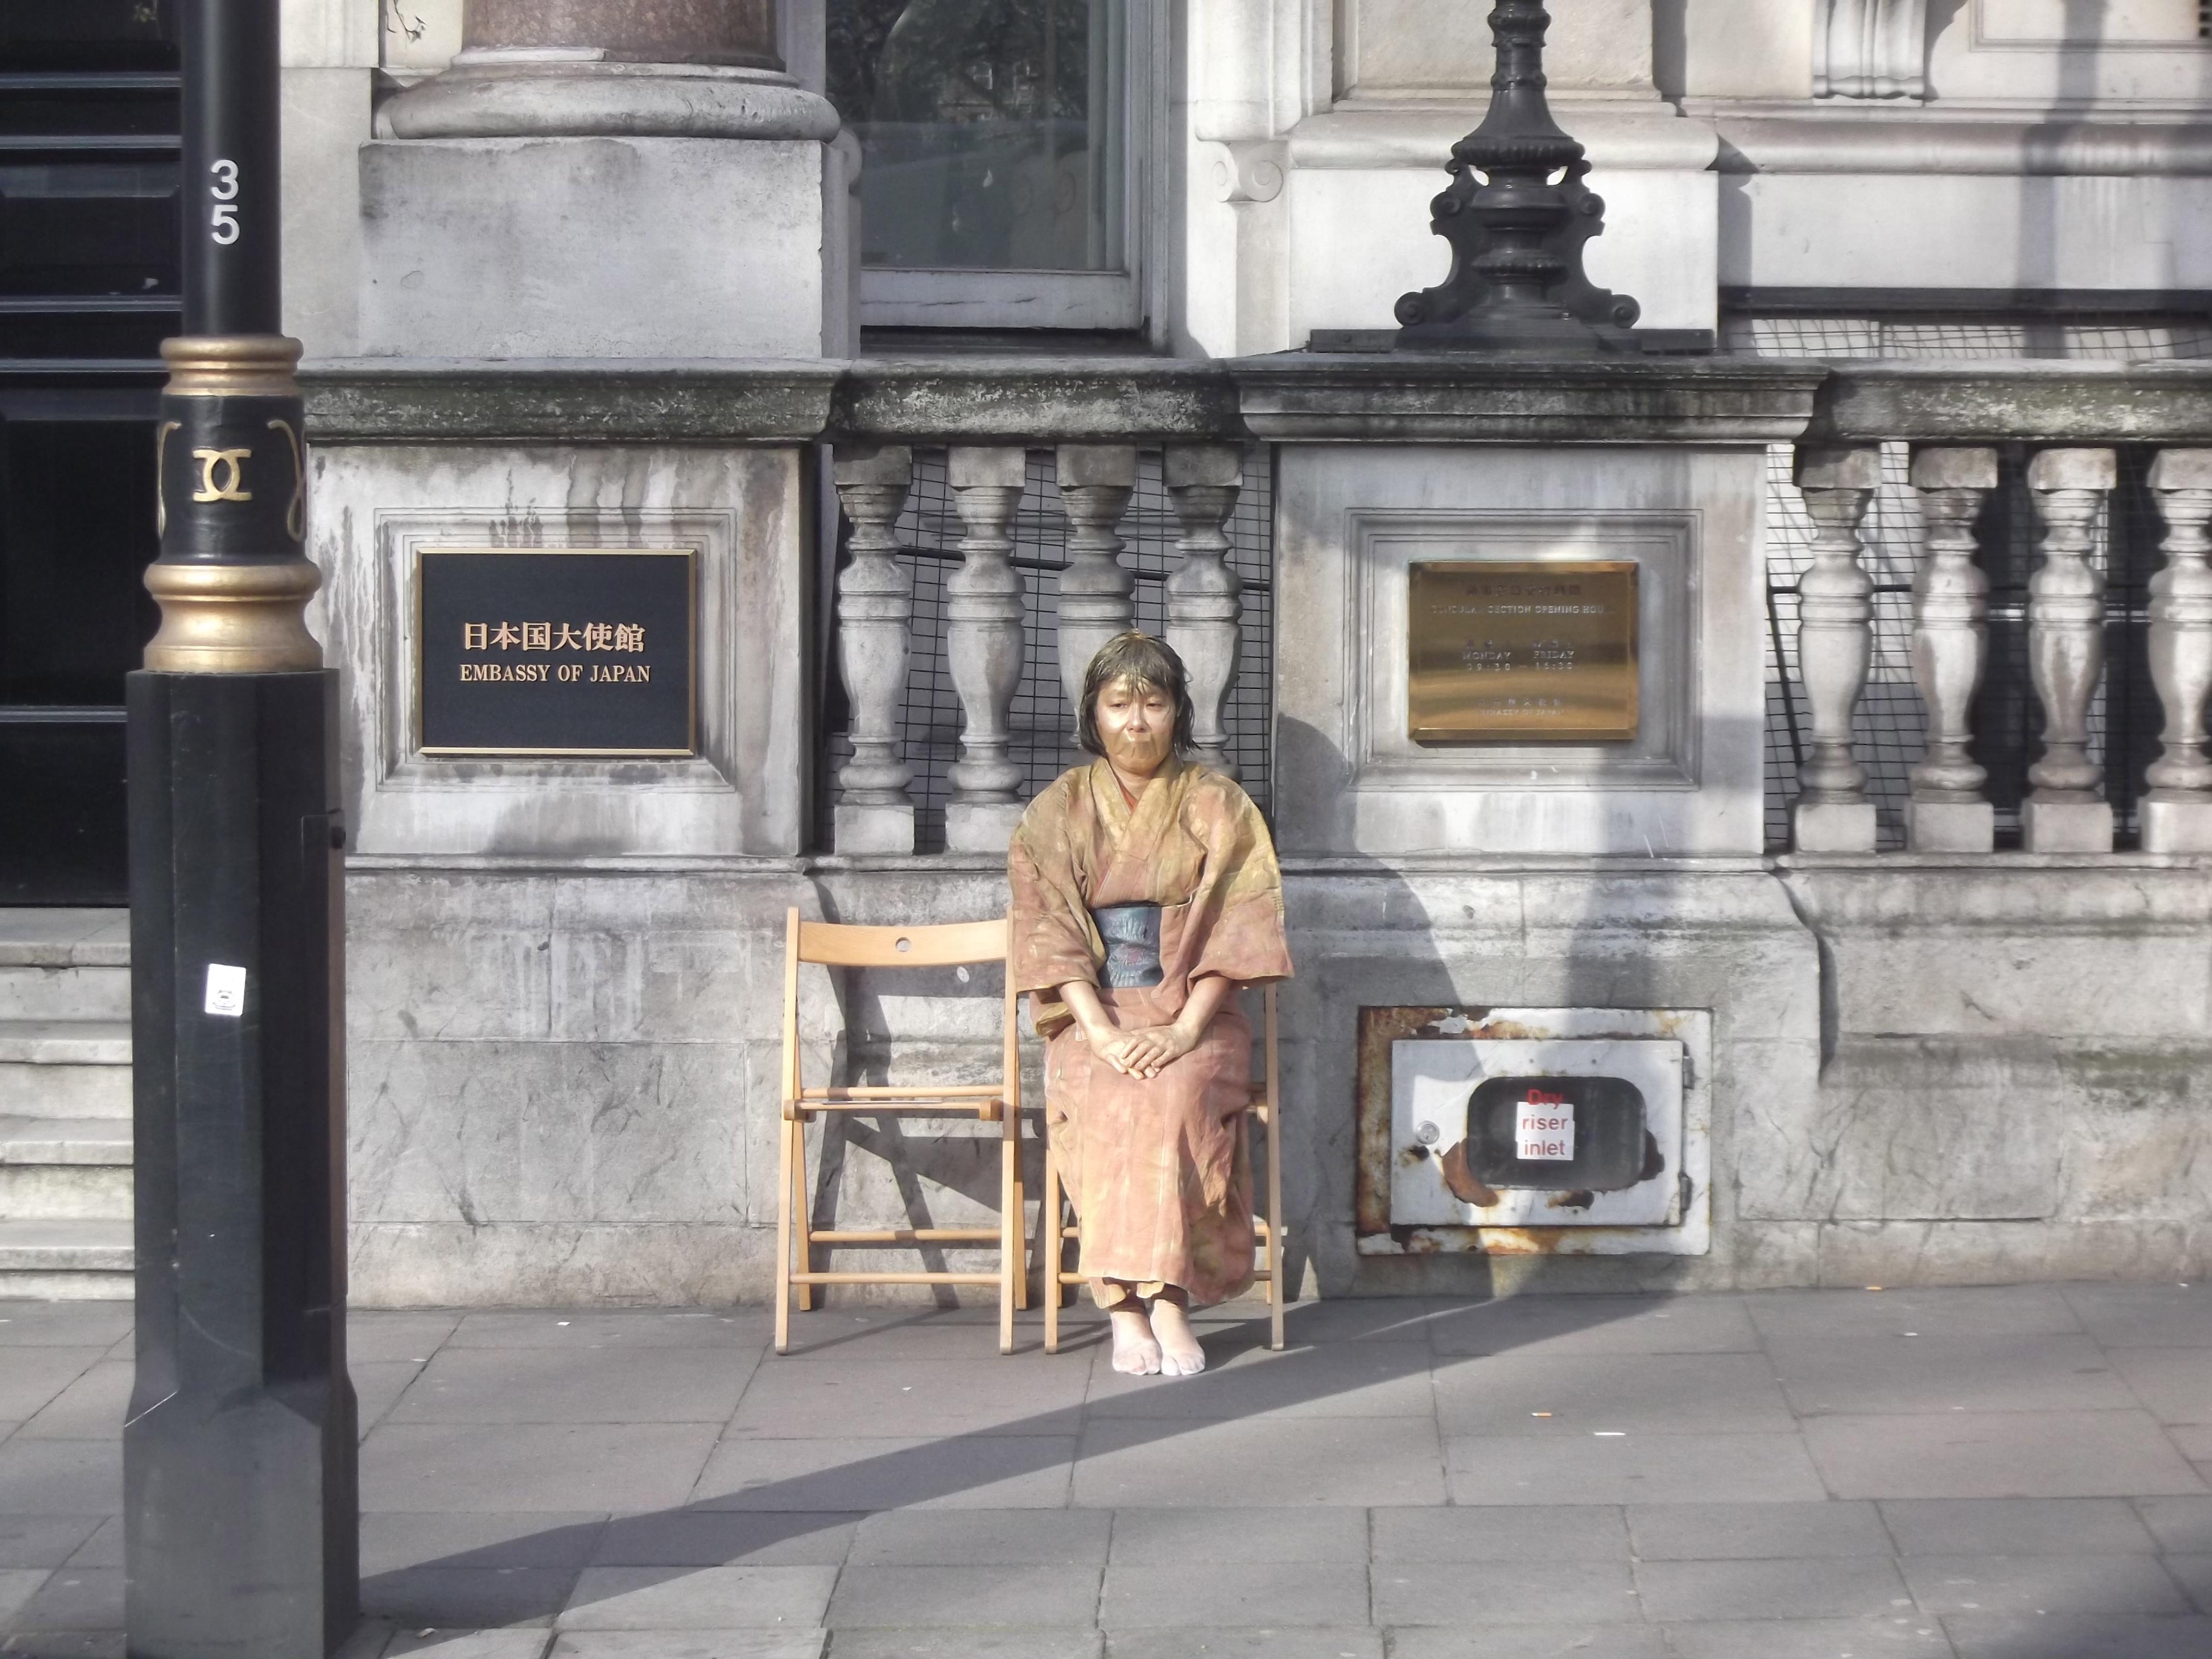 Image of Yoshiko Shimada from Wikidata